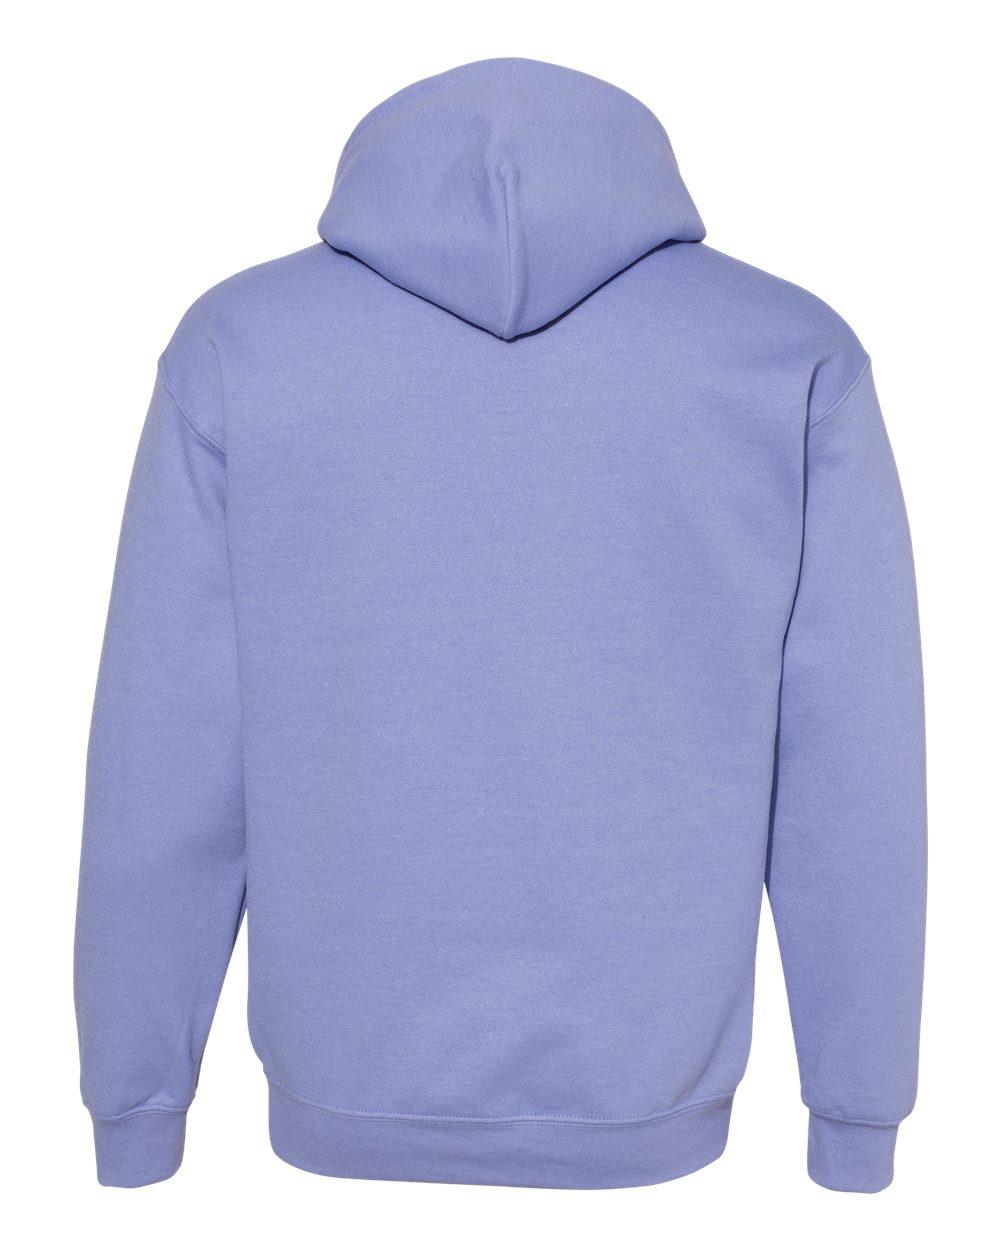 Gildan-Mens-Blank-Hoodie-Heavy-Blend-Hooded-Sweatshirt-Solid-18500-up-to-5XL thumbnail 99